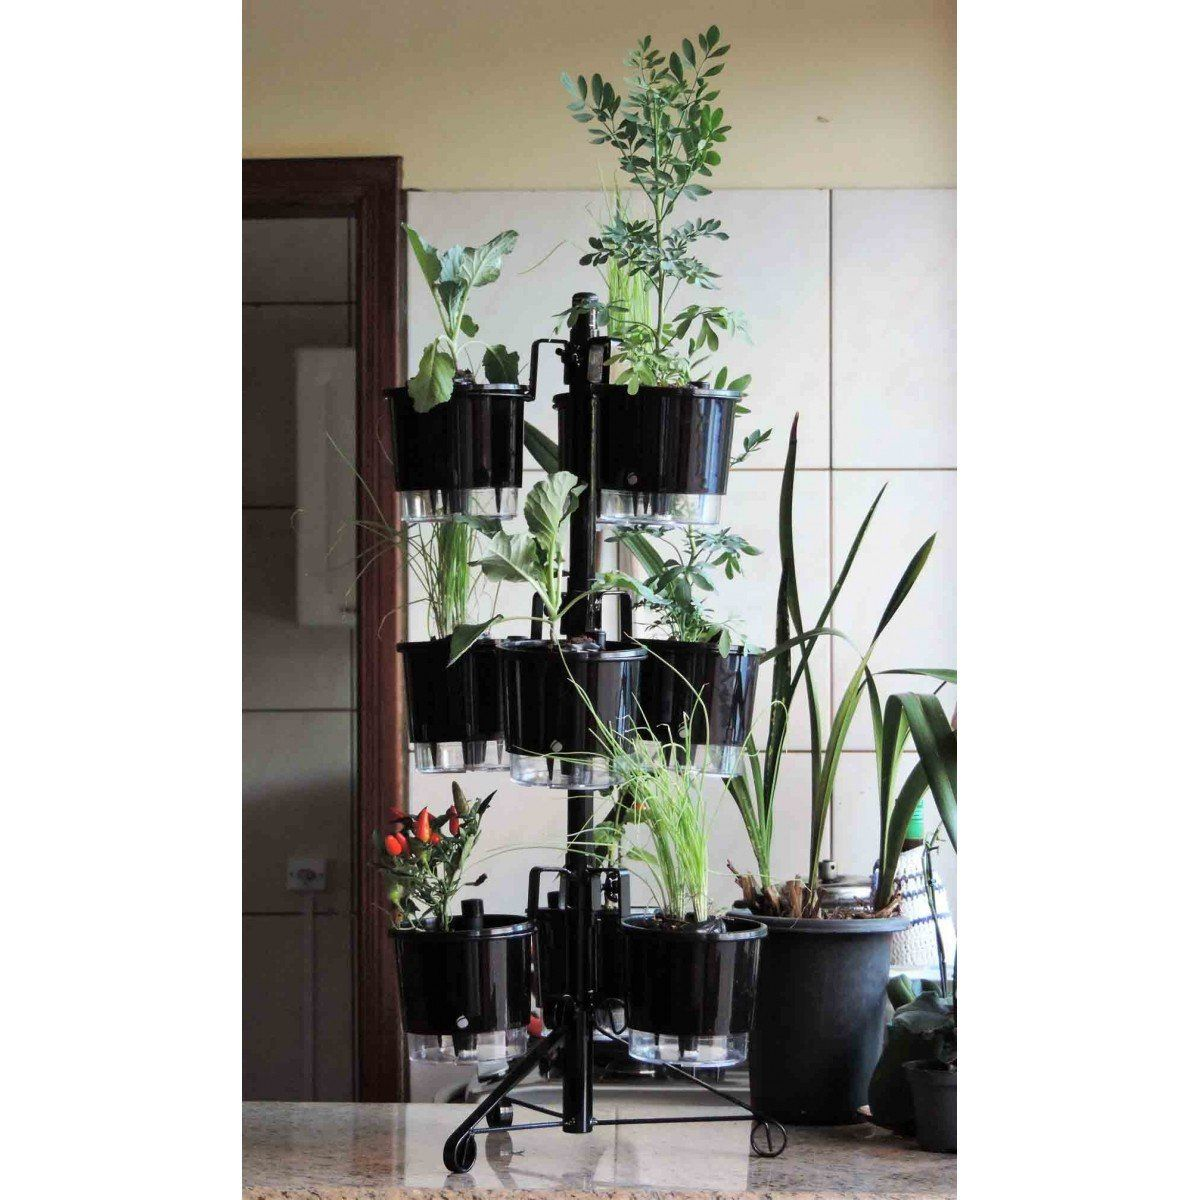 Suporte Preto para 9 Vasos Autoirrigáveis tamanho Pequeno N02 Raiz